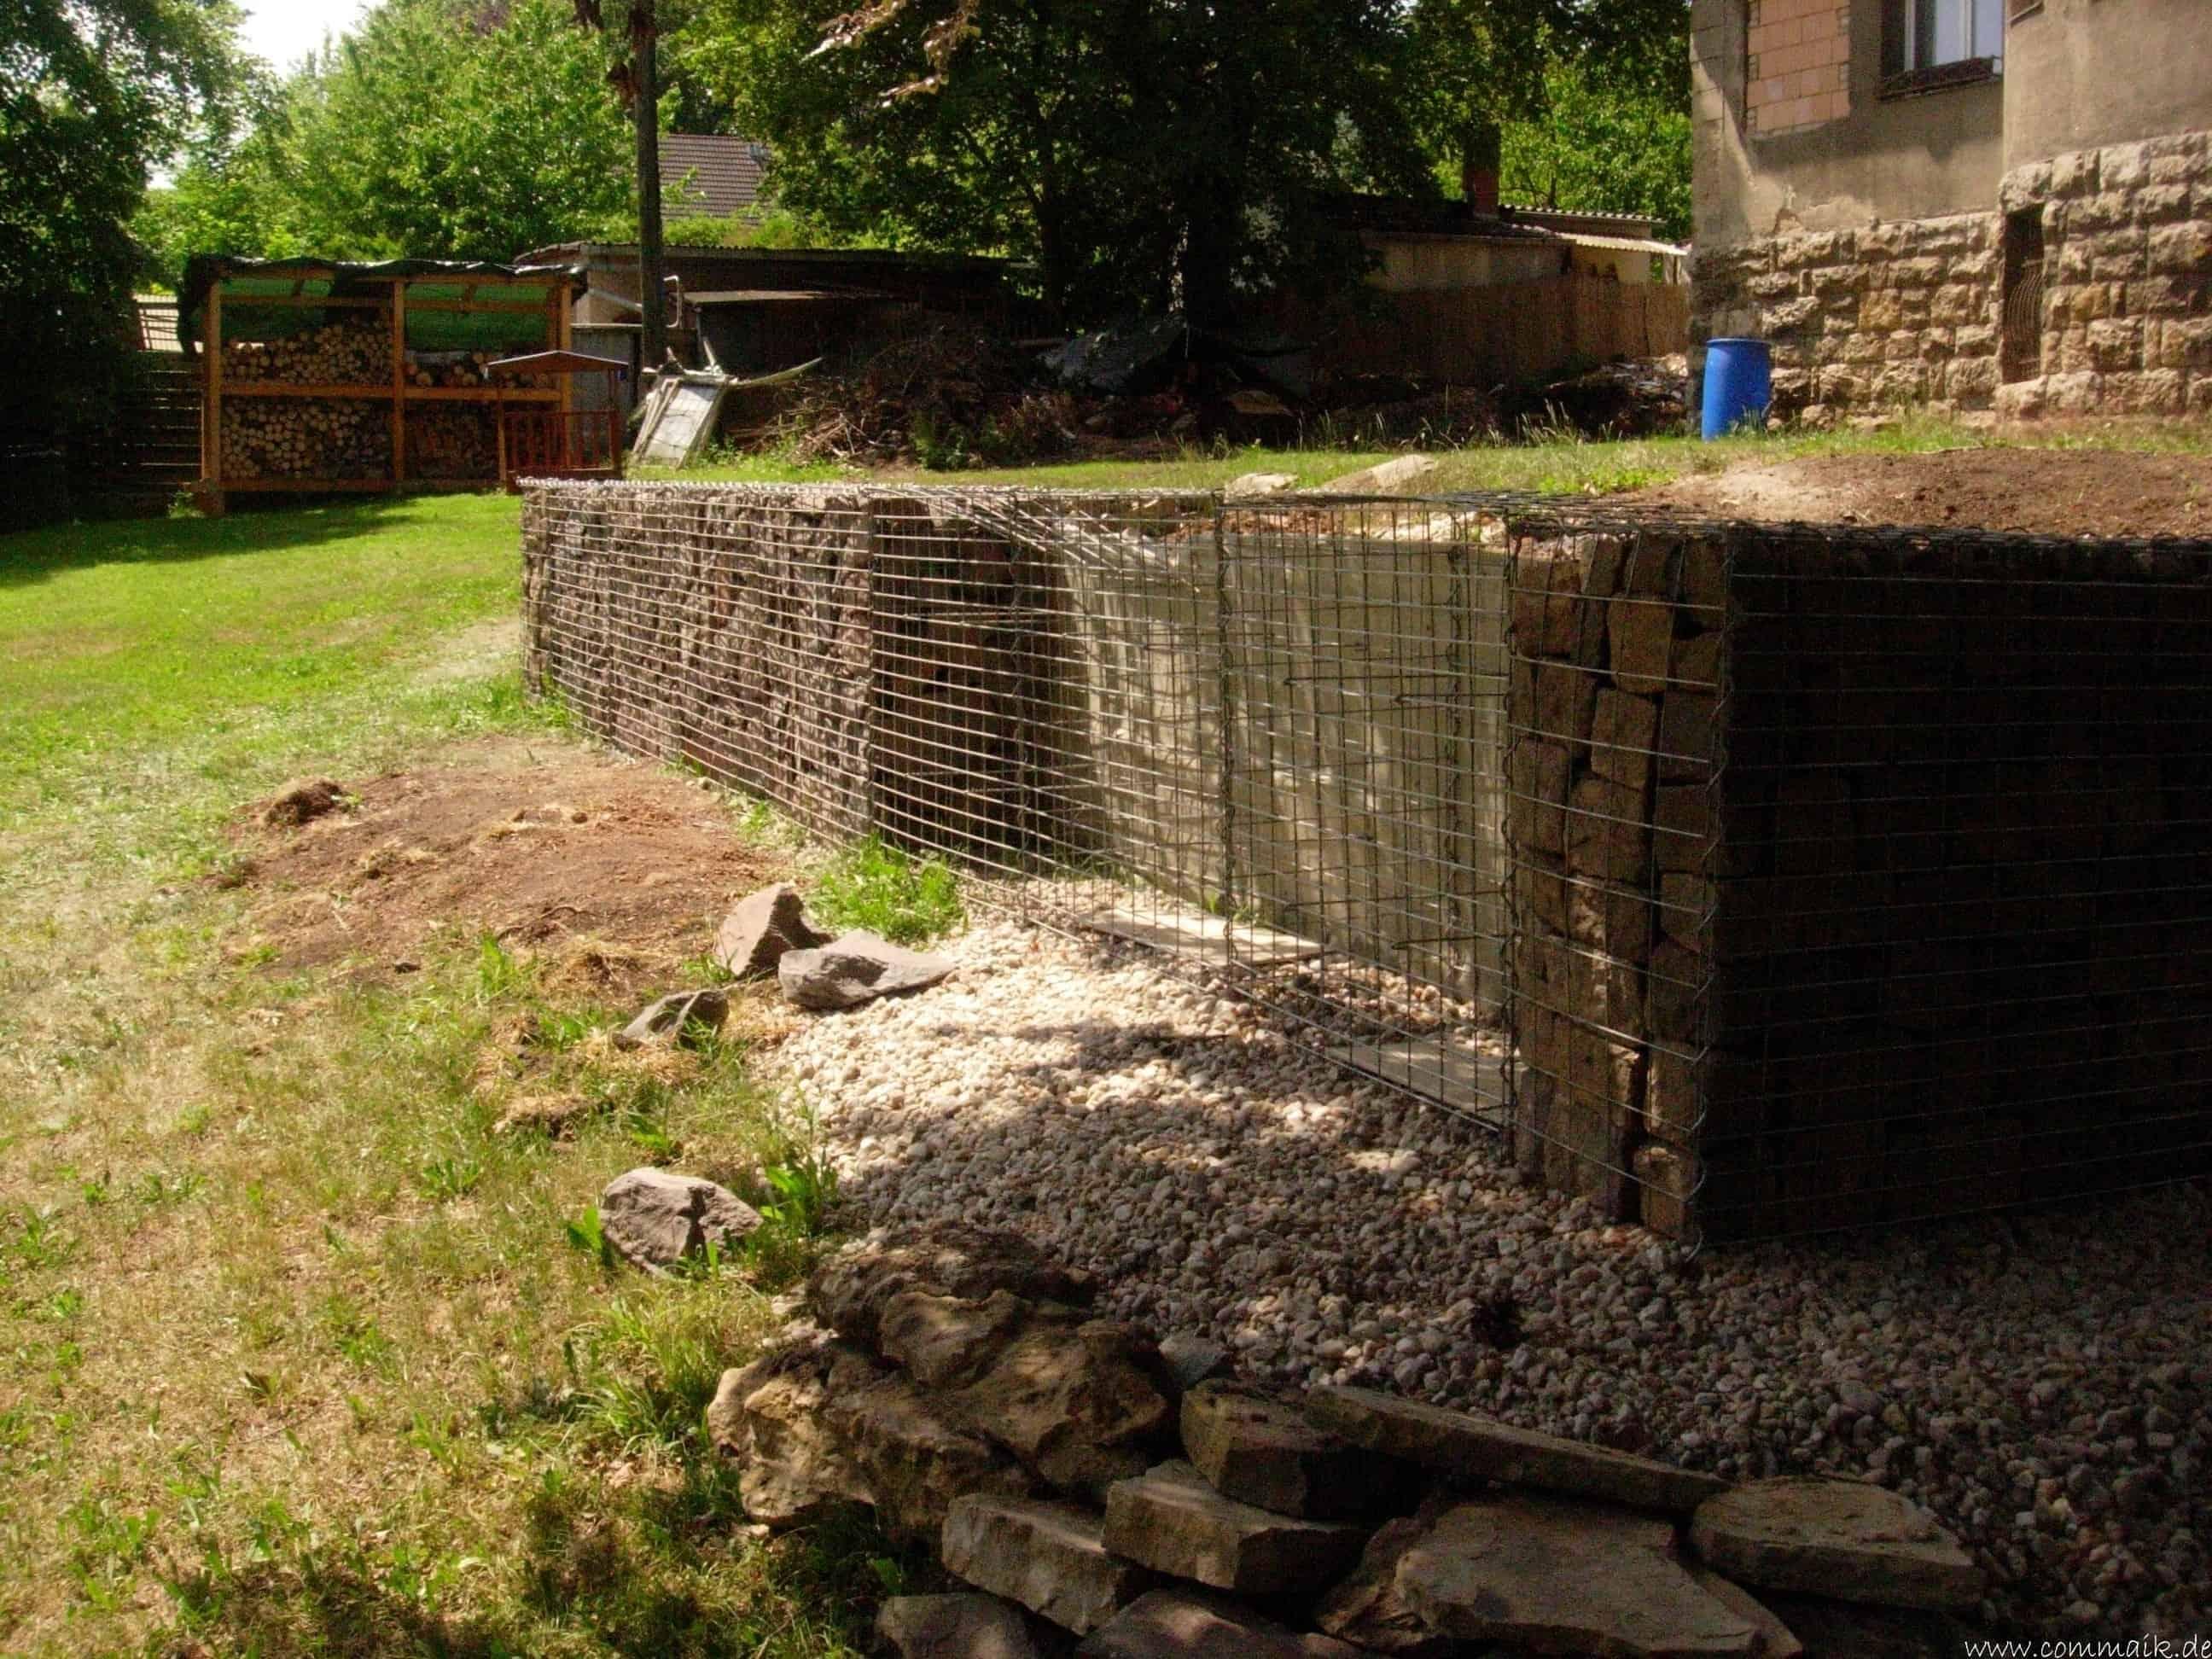 Extrem Der Bau unserer Gabionen Terrasse zum Abfang des Hangs | commaik ZT44